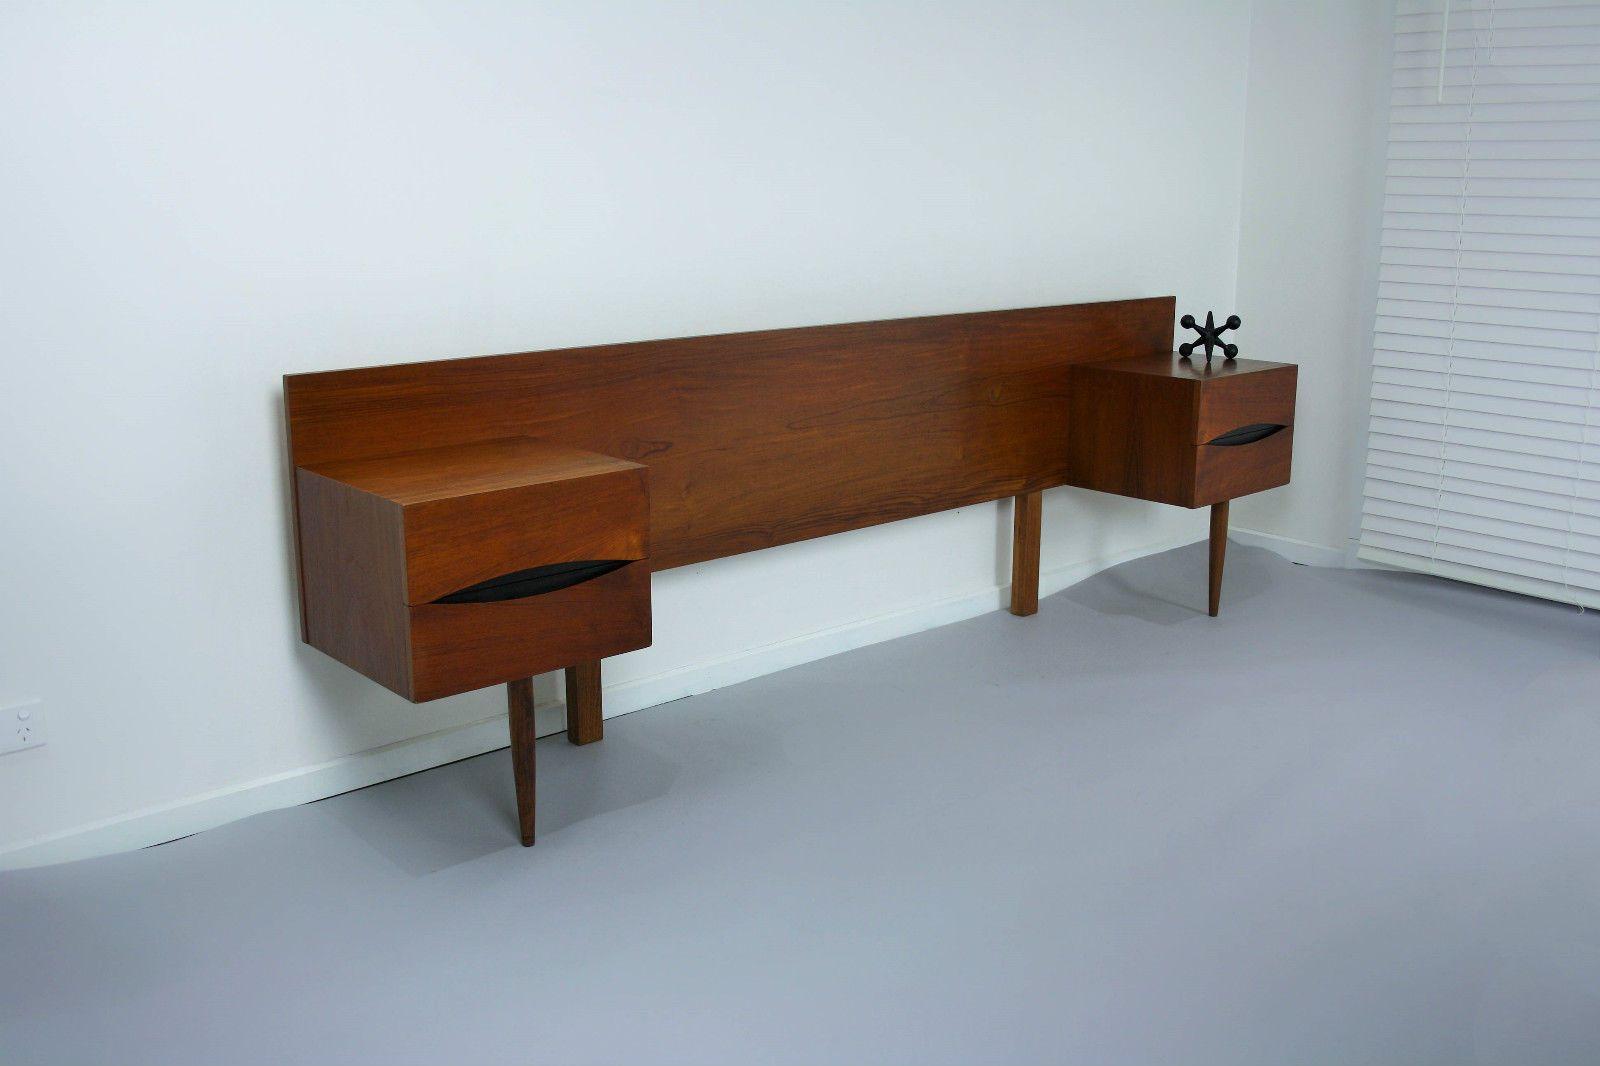 Mid century bedside tables drawers qb bedhead retro for Vintage danish modern bedroom furniture